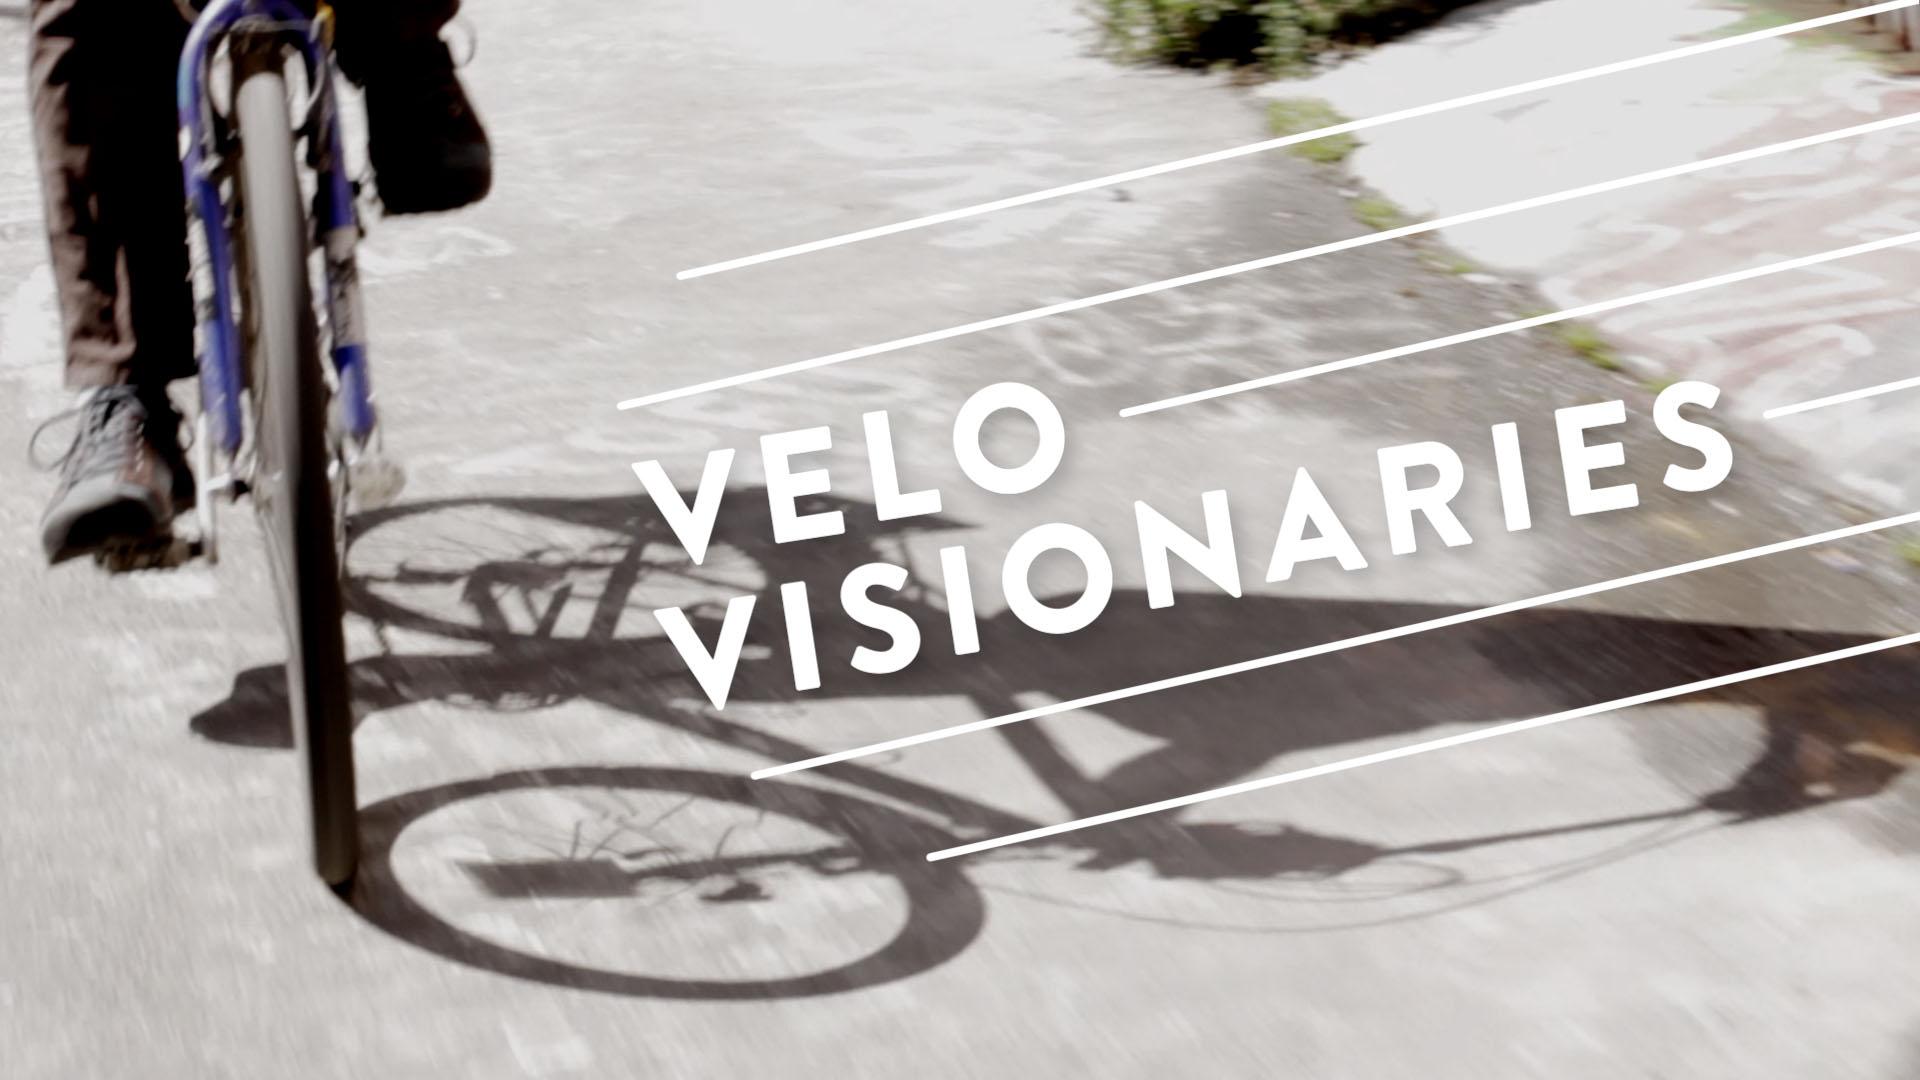 Velo Visionaries